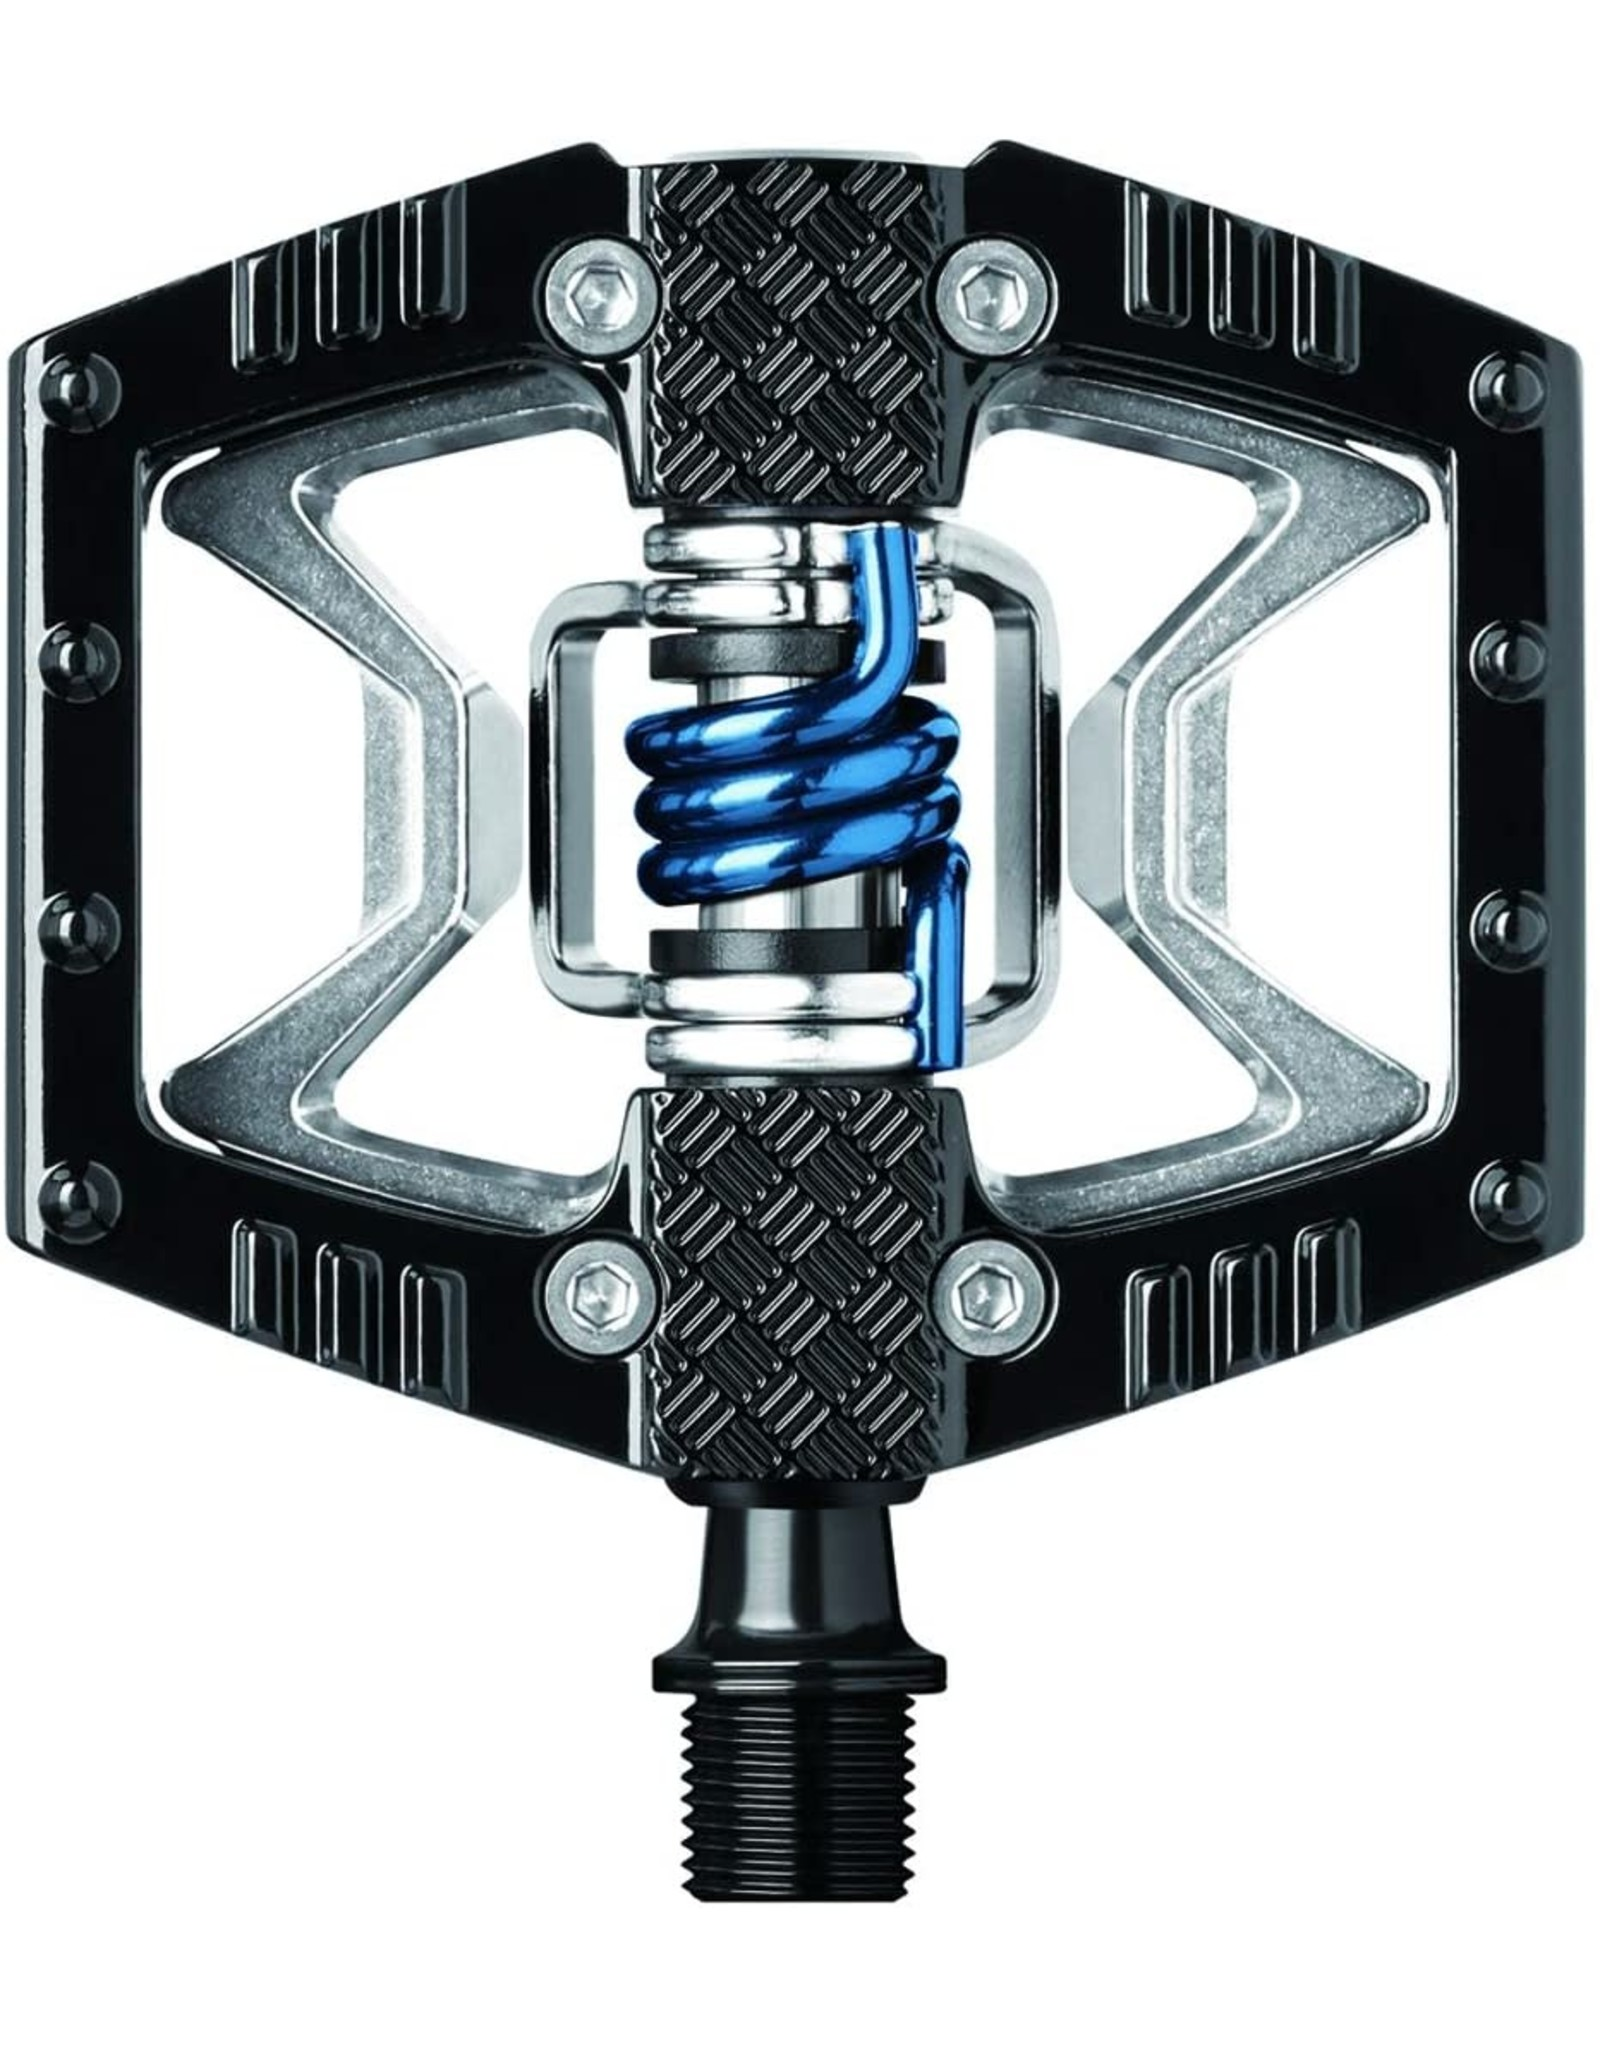 Crank Brothers CrankBros - Doubleshot 2 Black & Raw / Blue Spring